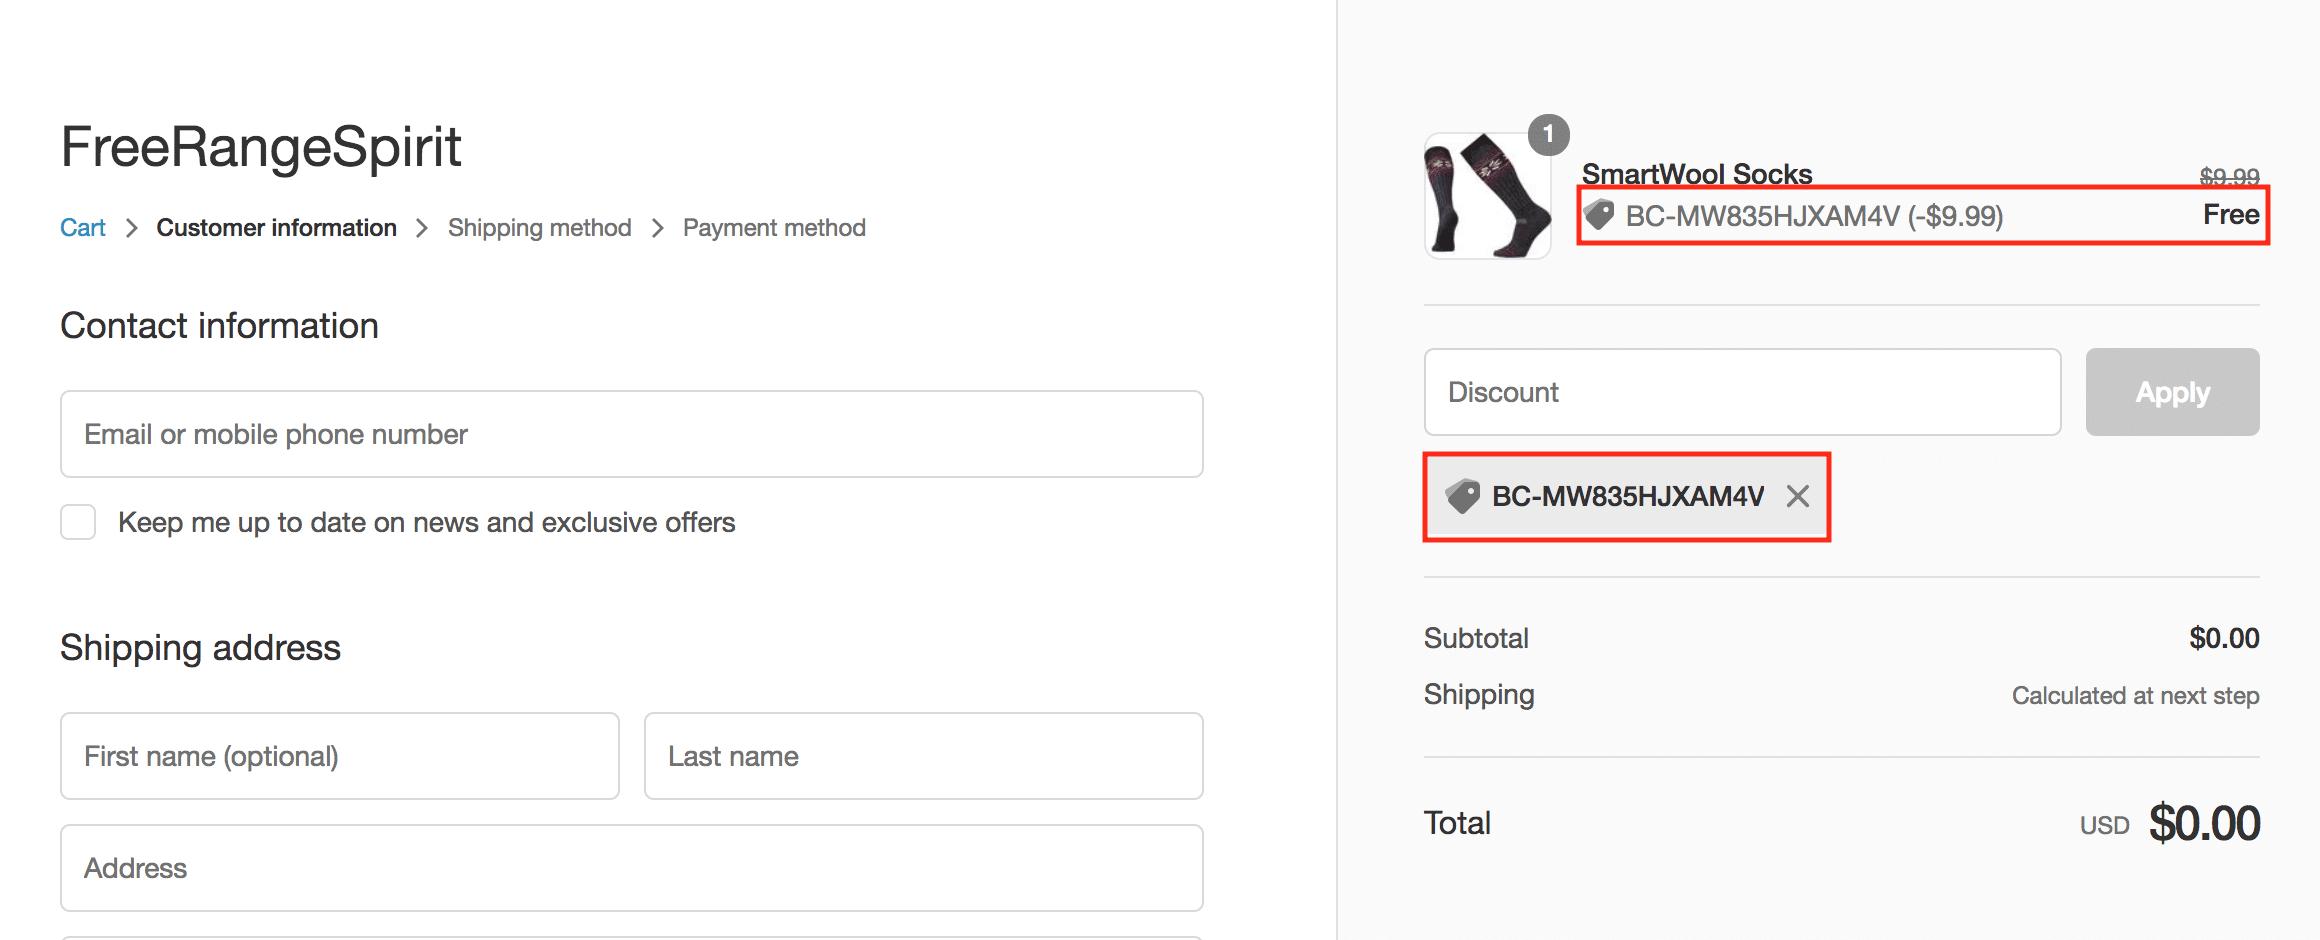 Ambassador onboarding discount code Shopify checkout socks